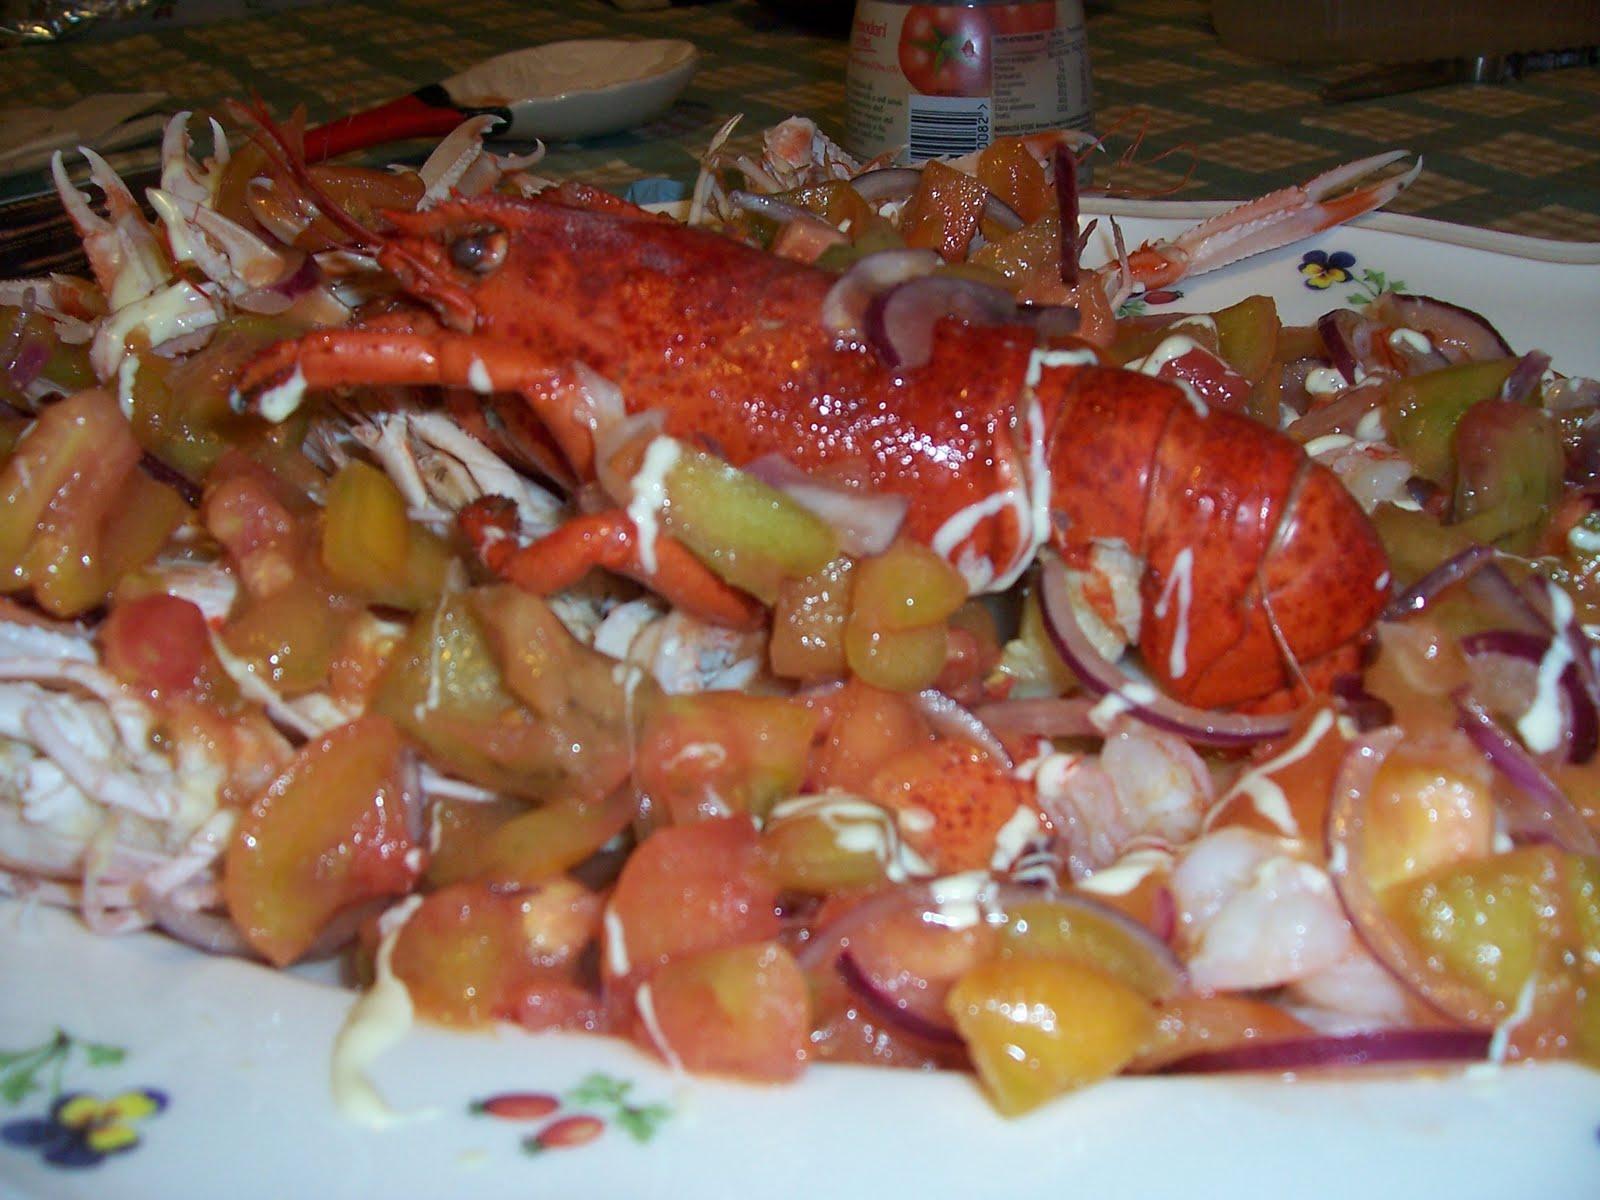 La Cucina Di Valentina: Catalana Di Crostacei! #A53F26 1600 1200 Foto Di Mattonelle Per Cucina